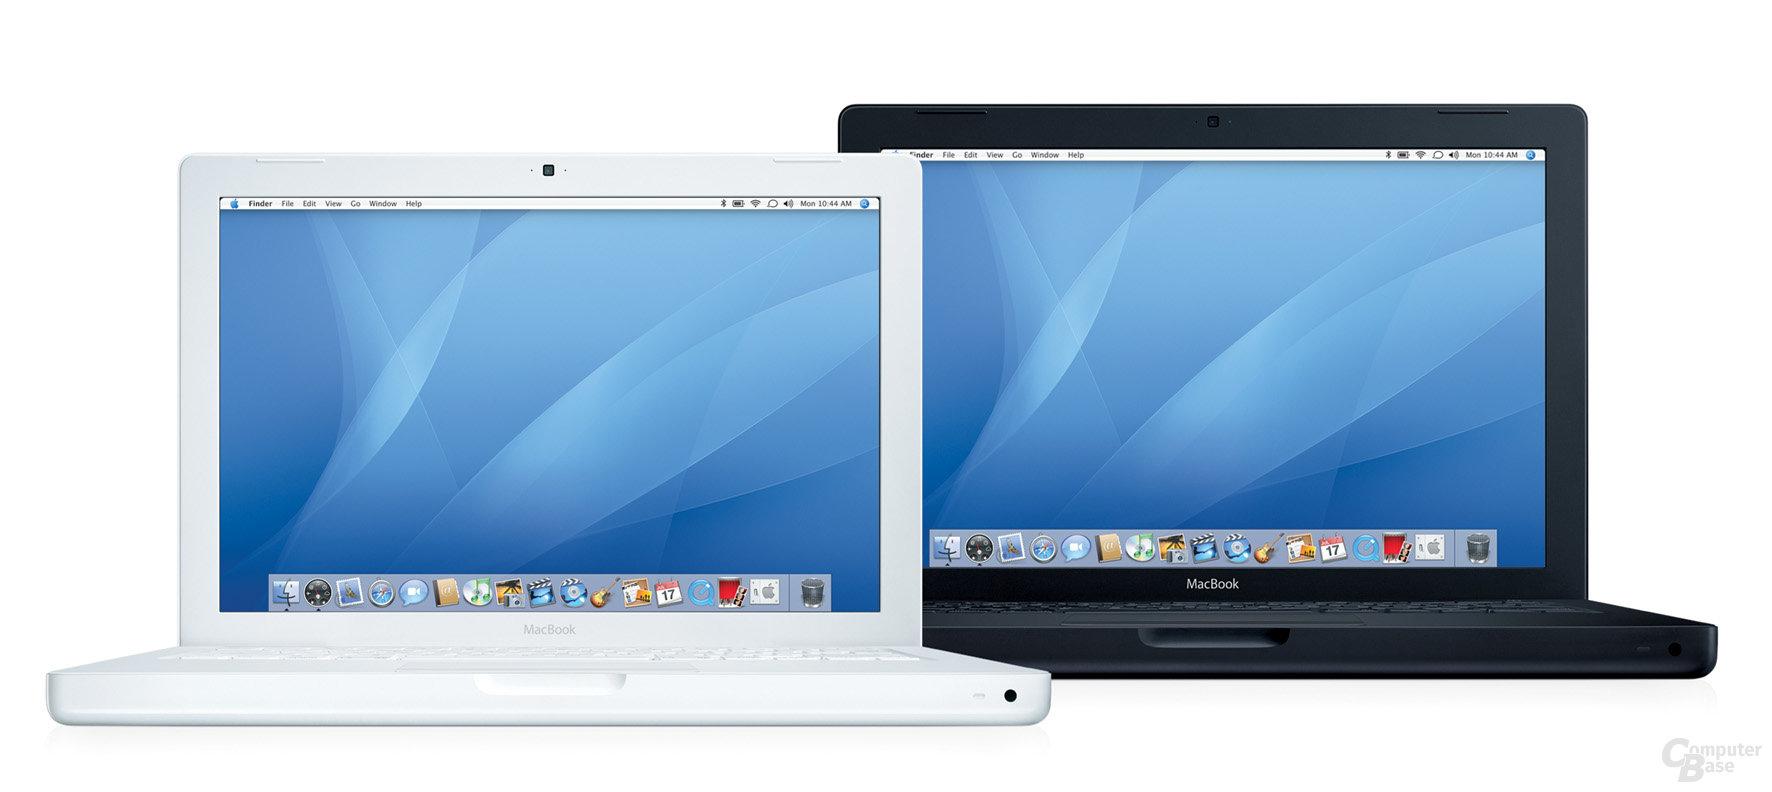 MacBook mit Intel Core Duo-Prozessoren